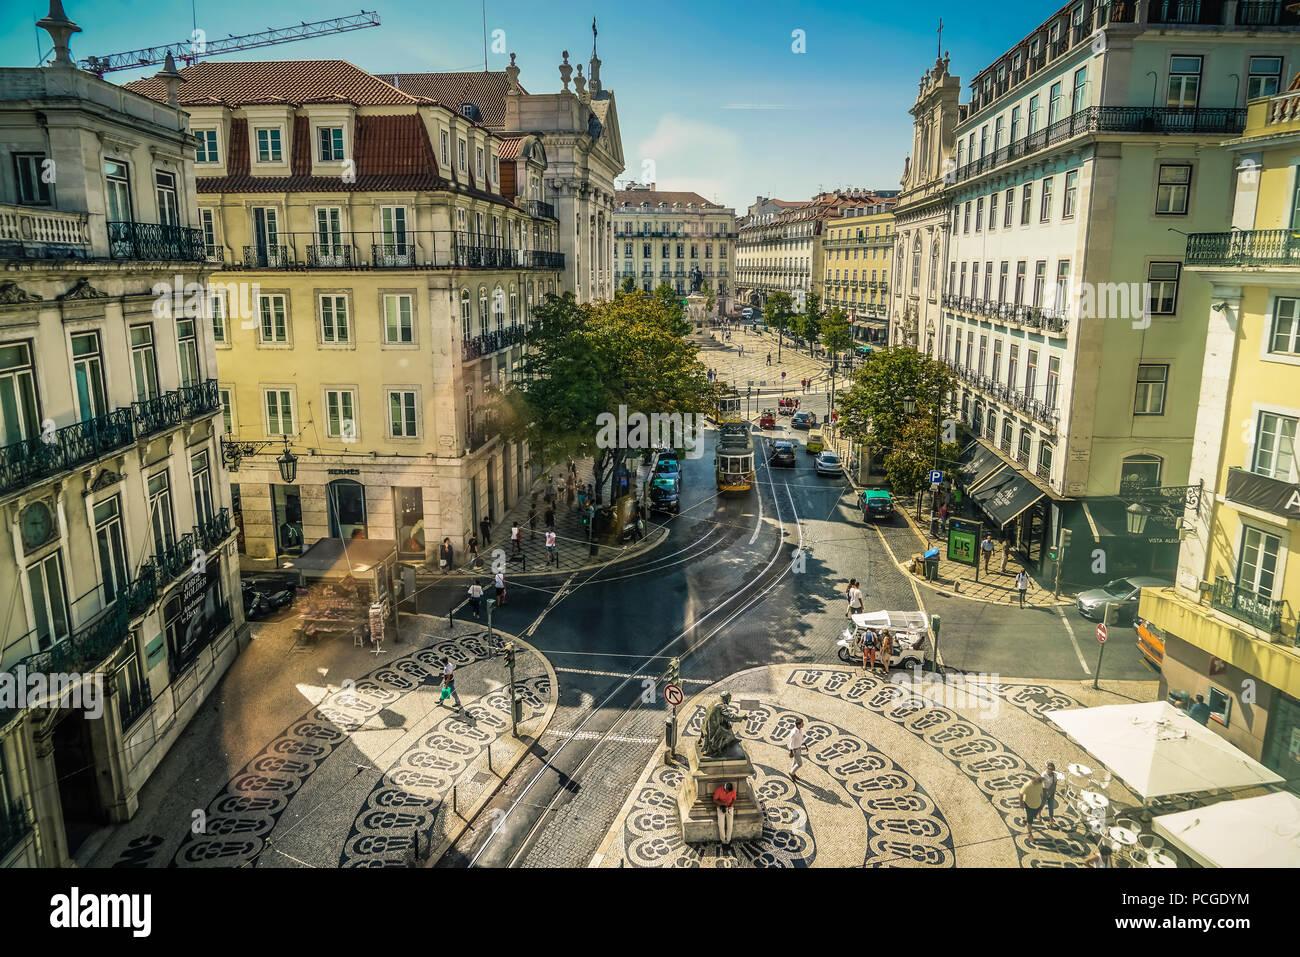 Lisbonne. Praca de Camoes Chiado avec en arrière-plan. Photo Stock